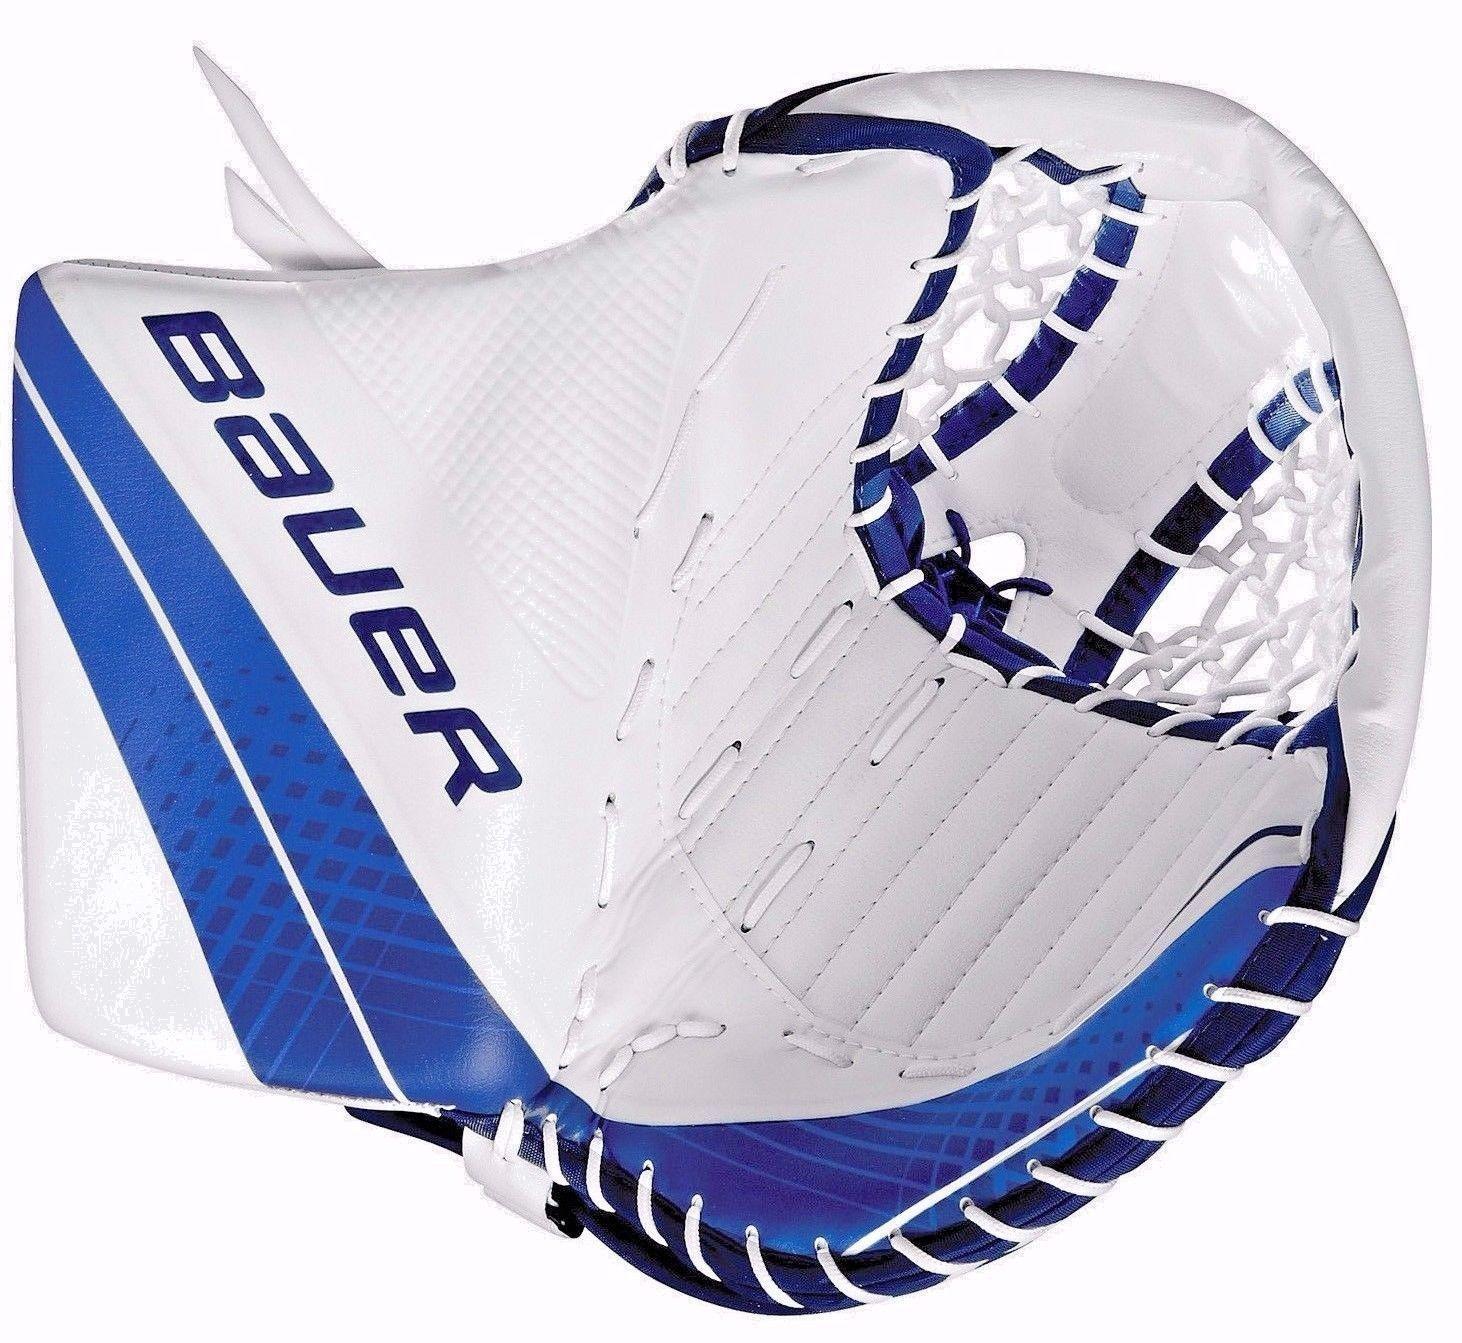 Gloves And Blockers 79763 New Bauer Vapor X900 Goalie Trapper Left Hand Intermediate White Blue Glove Buy It Now Only Blue Gloves Goalie Goalie Stick